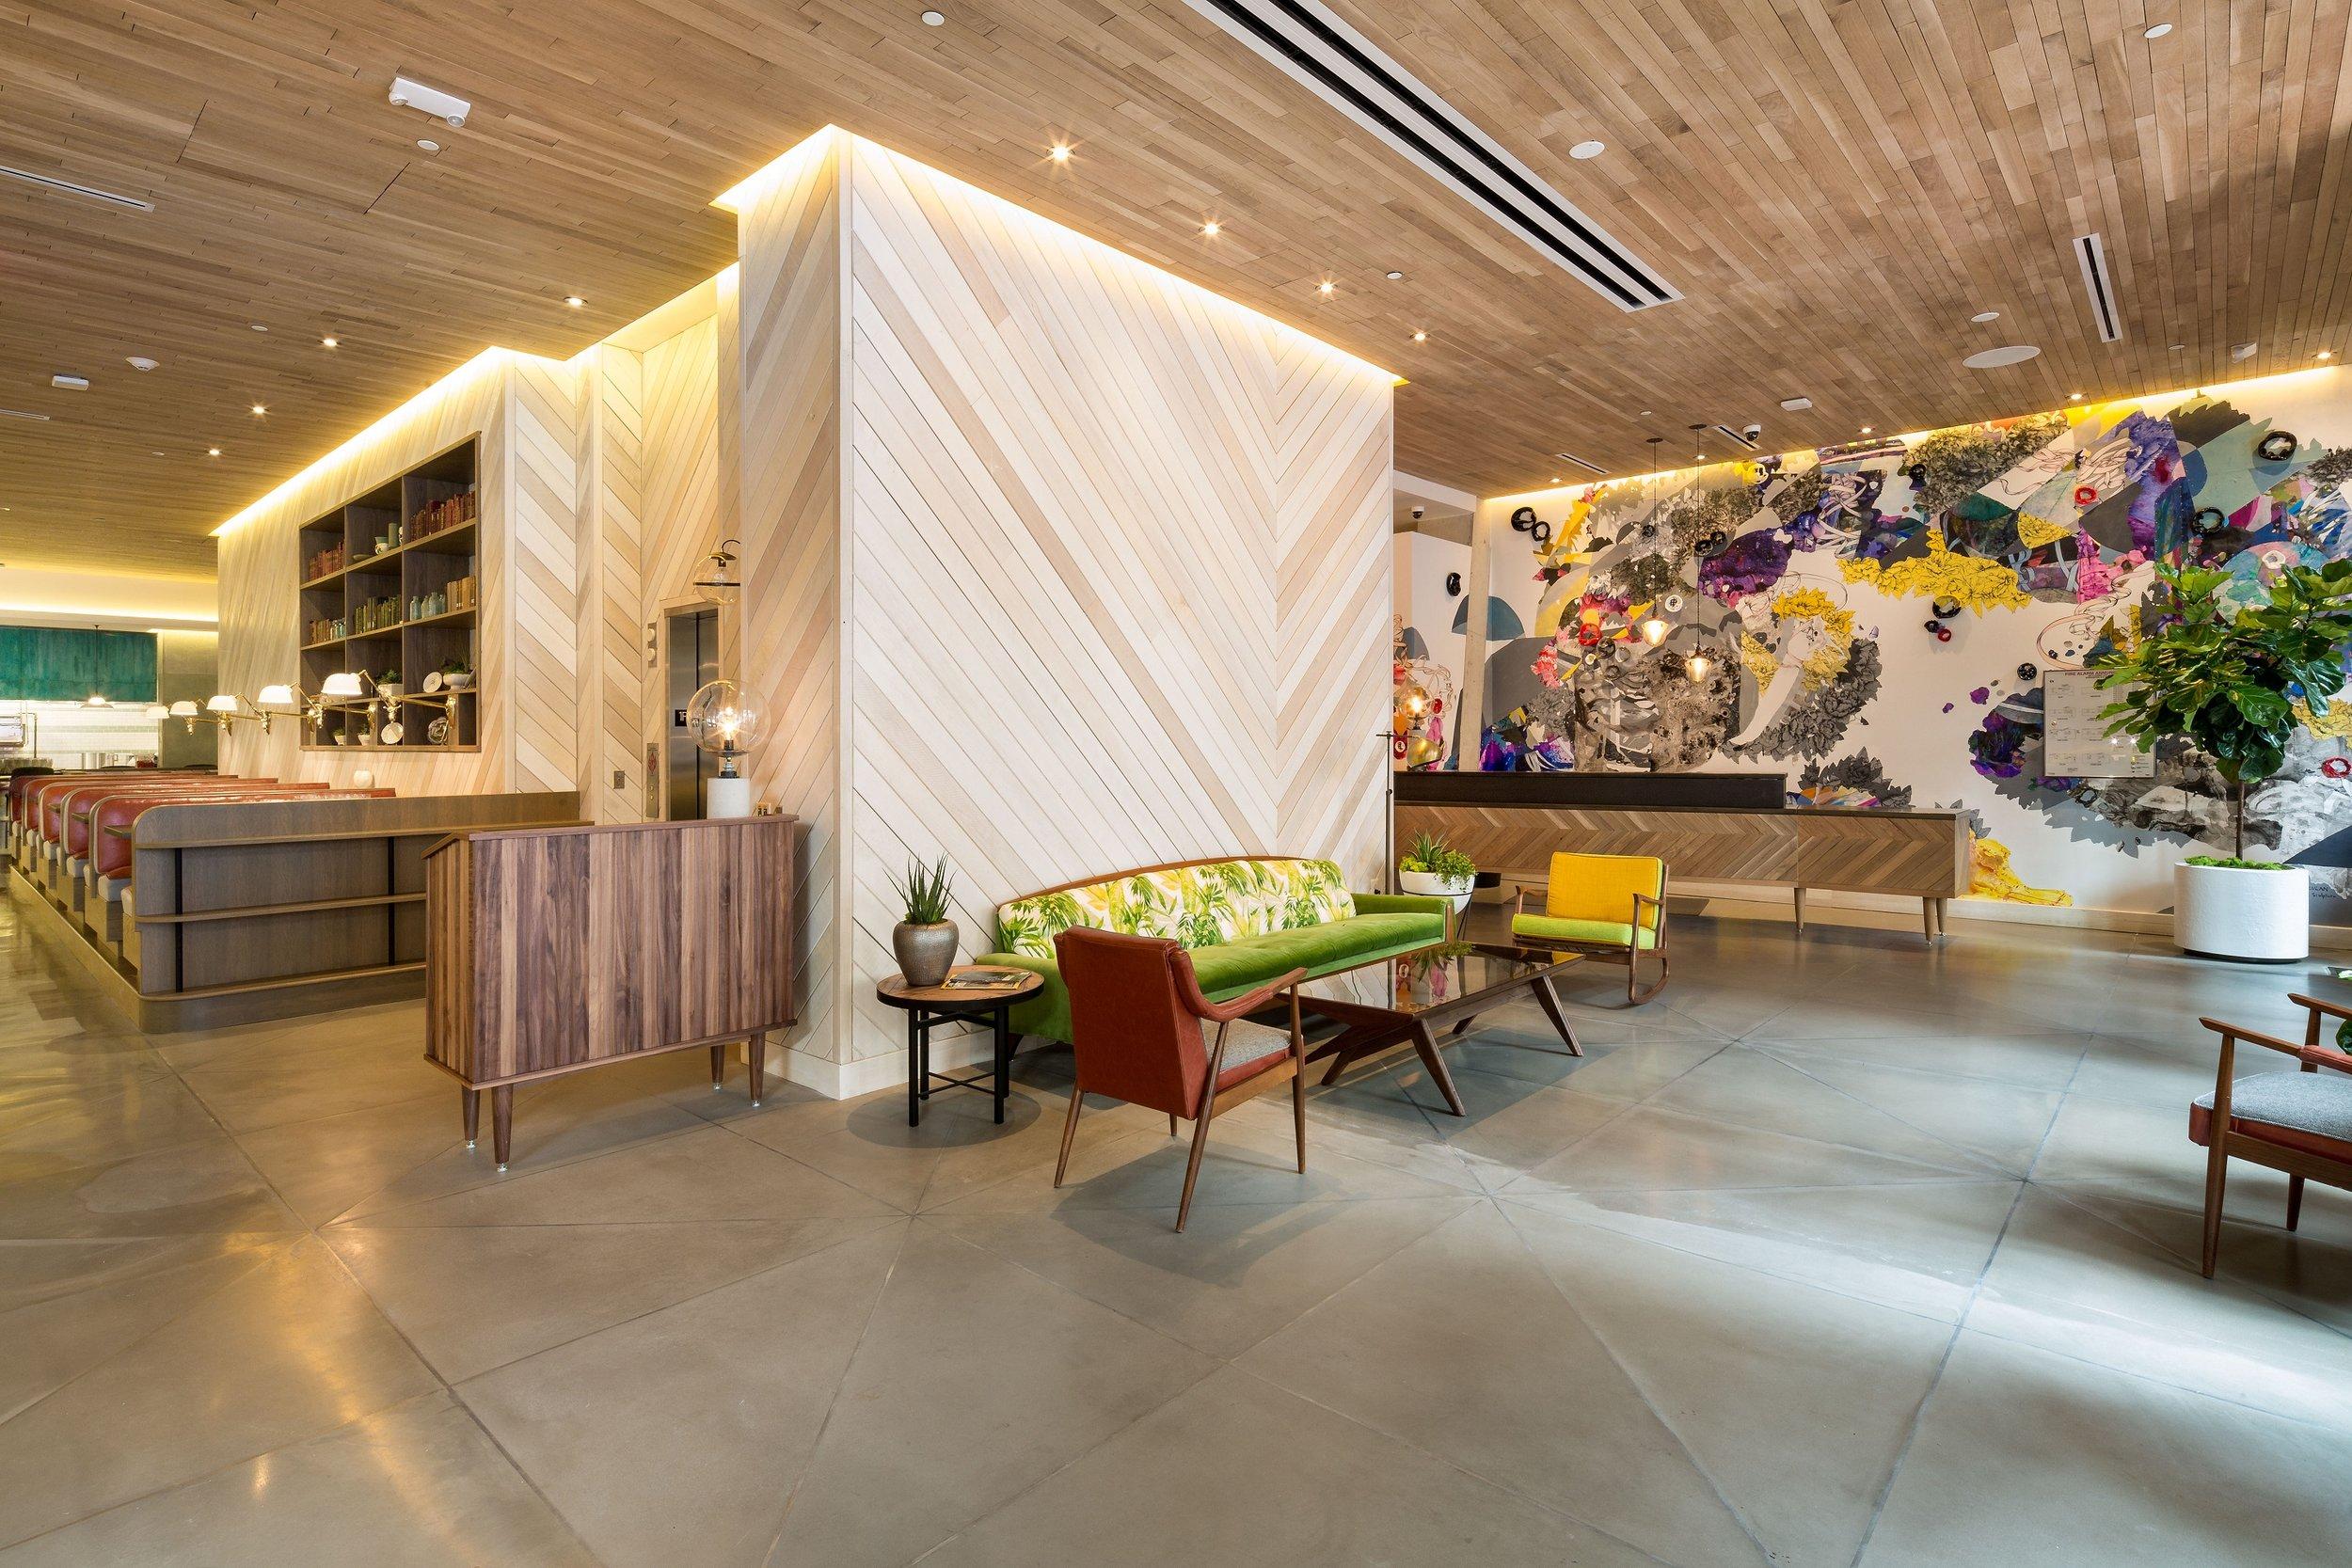 studio-saint-hotels-pod-hotel-crimson-diner-washington-dc-5